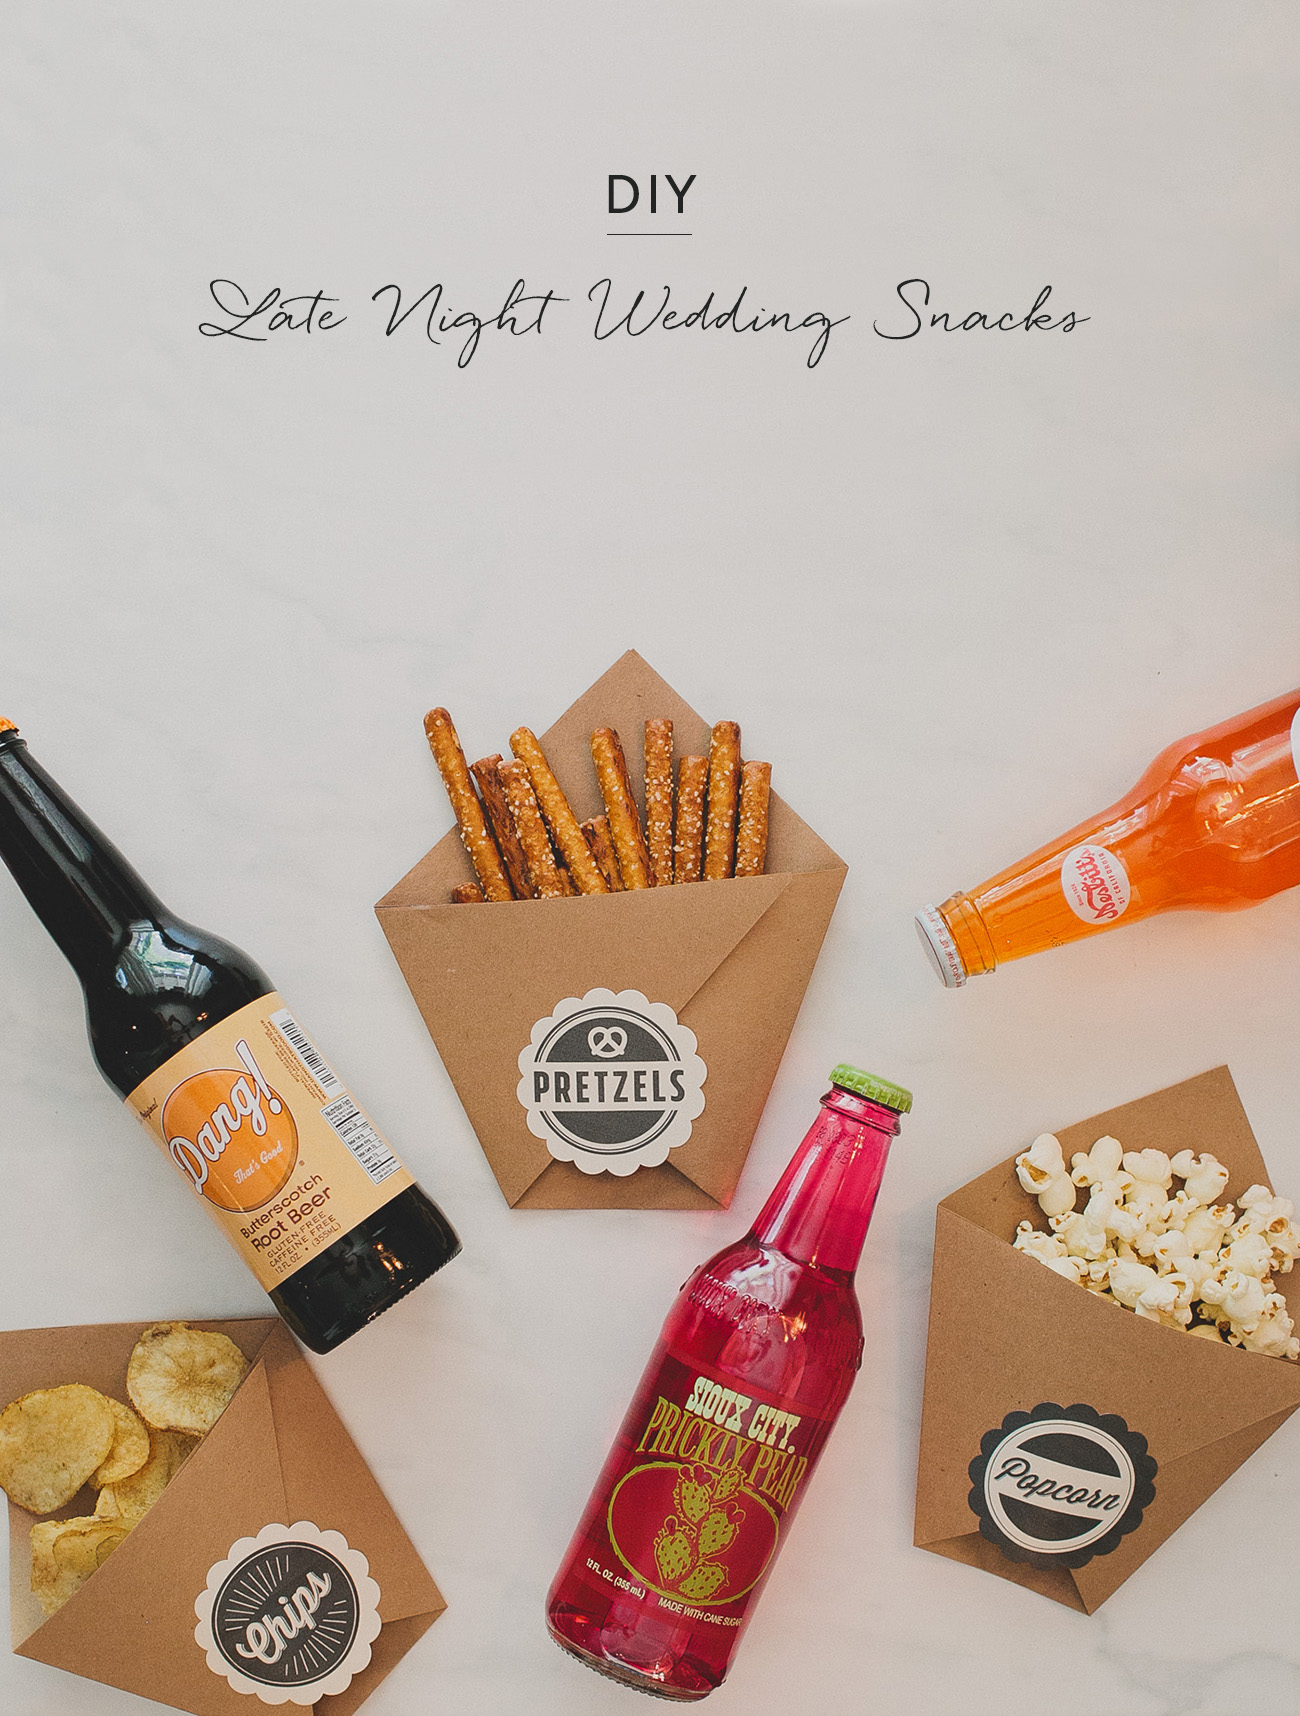 DIY Late Night Wedding Snacks